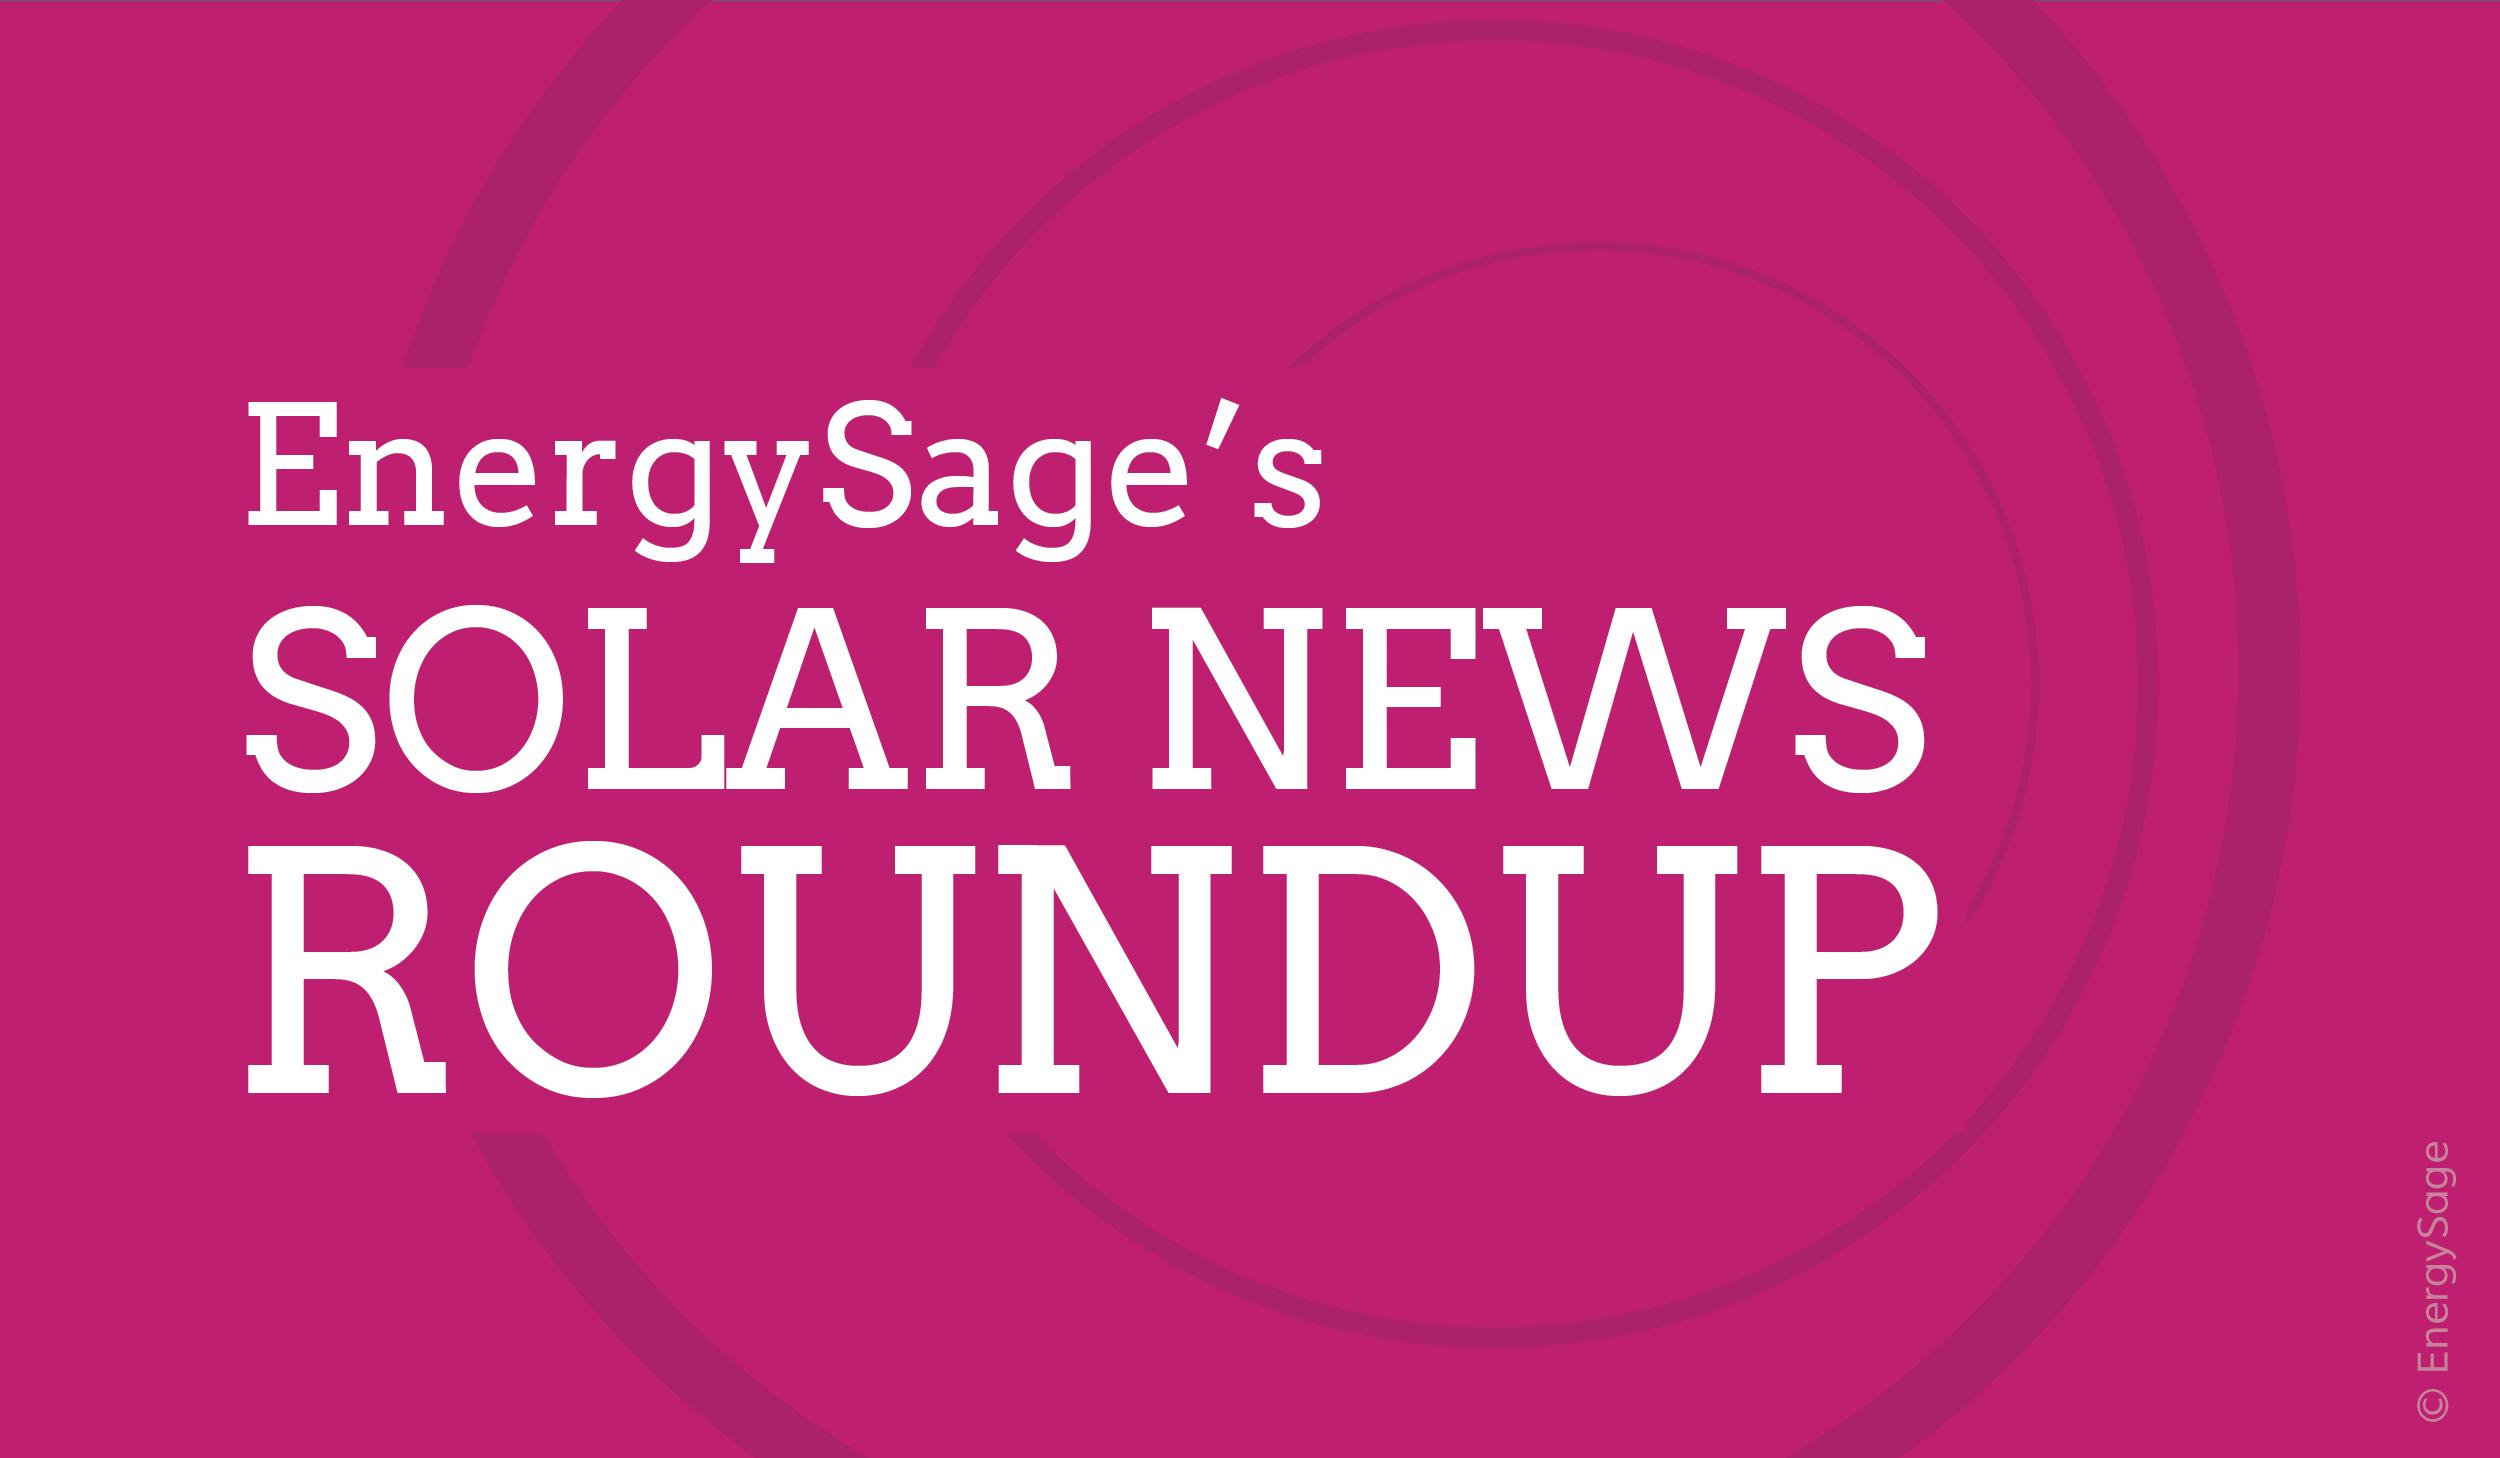 EnergySage Solar News Roundup